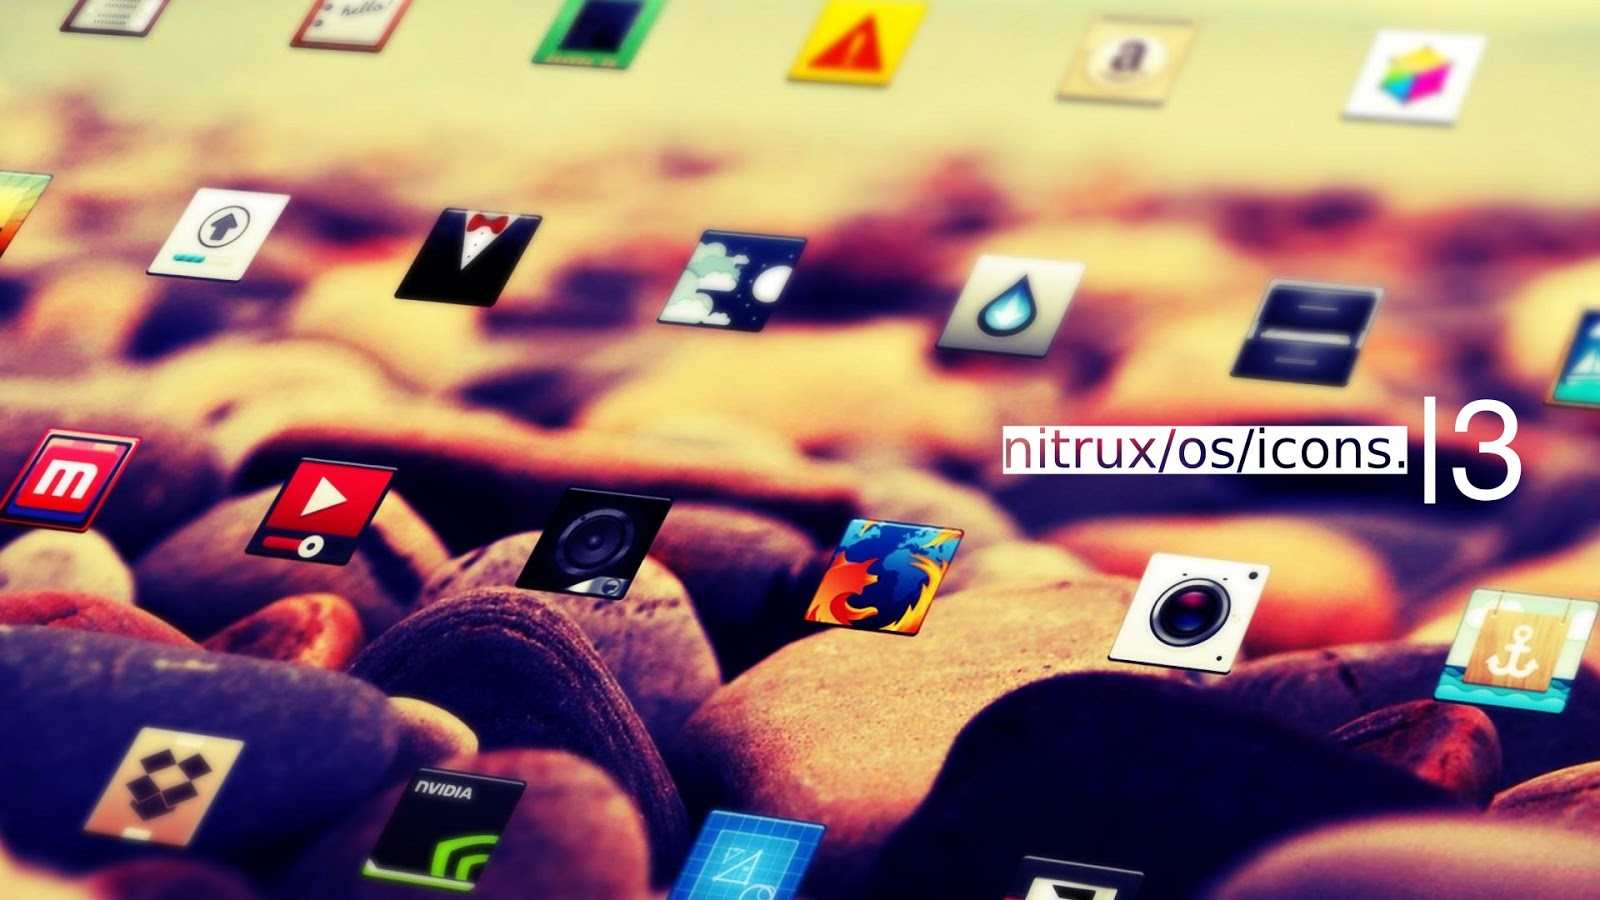 http://4.bp.blogspot.com/-REOykoqZZqE/UYotjrOi-3I/AAAAAAAALtY/8Erq91wYPn0/s1600/nitrux_os_icons.jpg